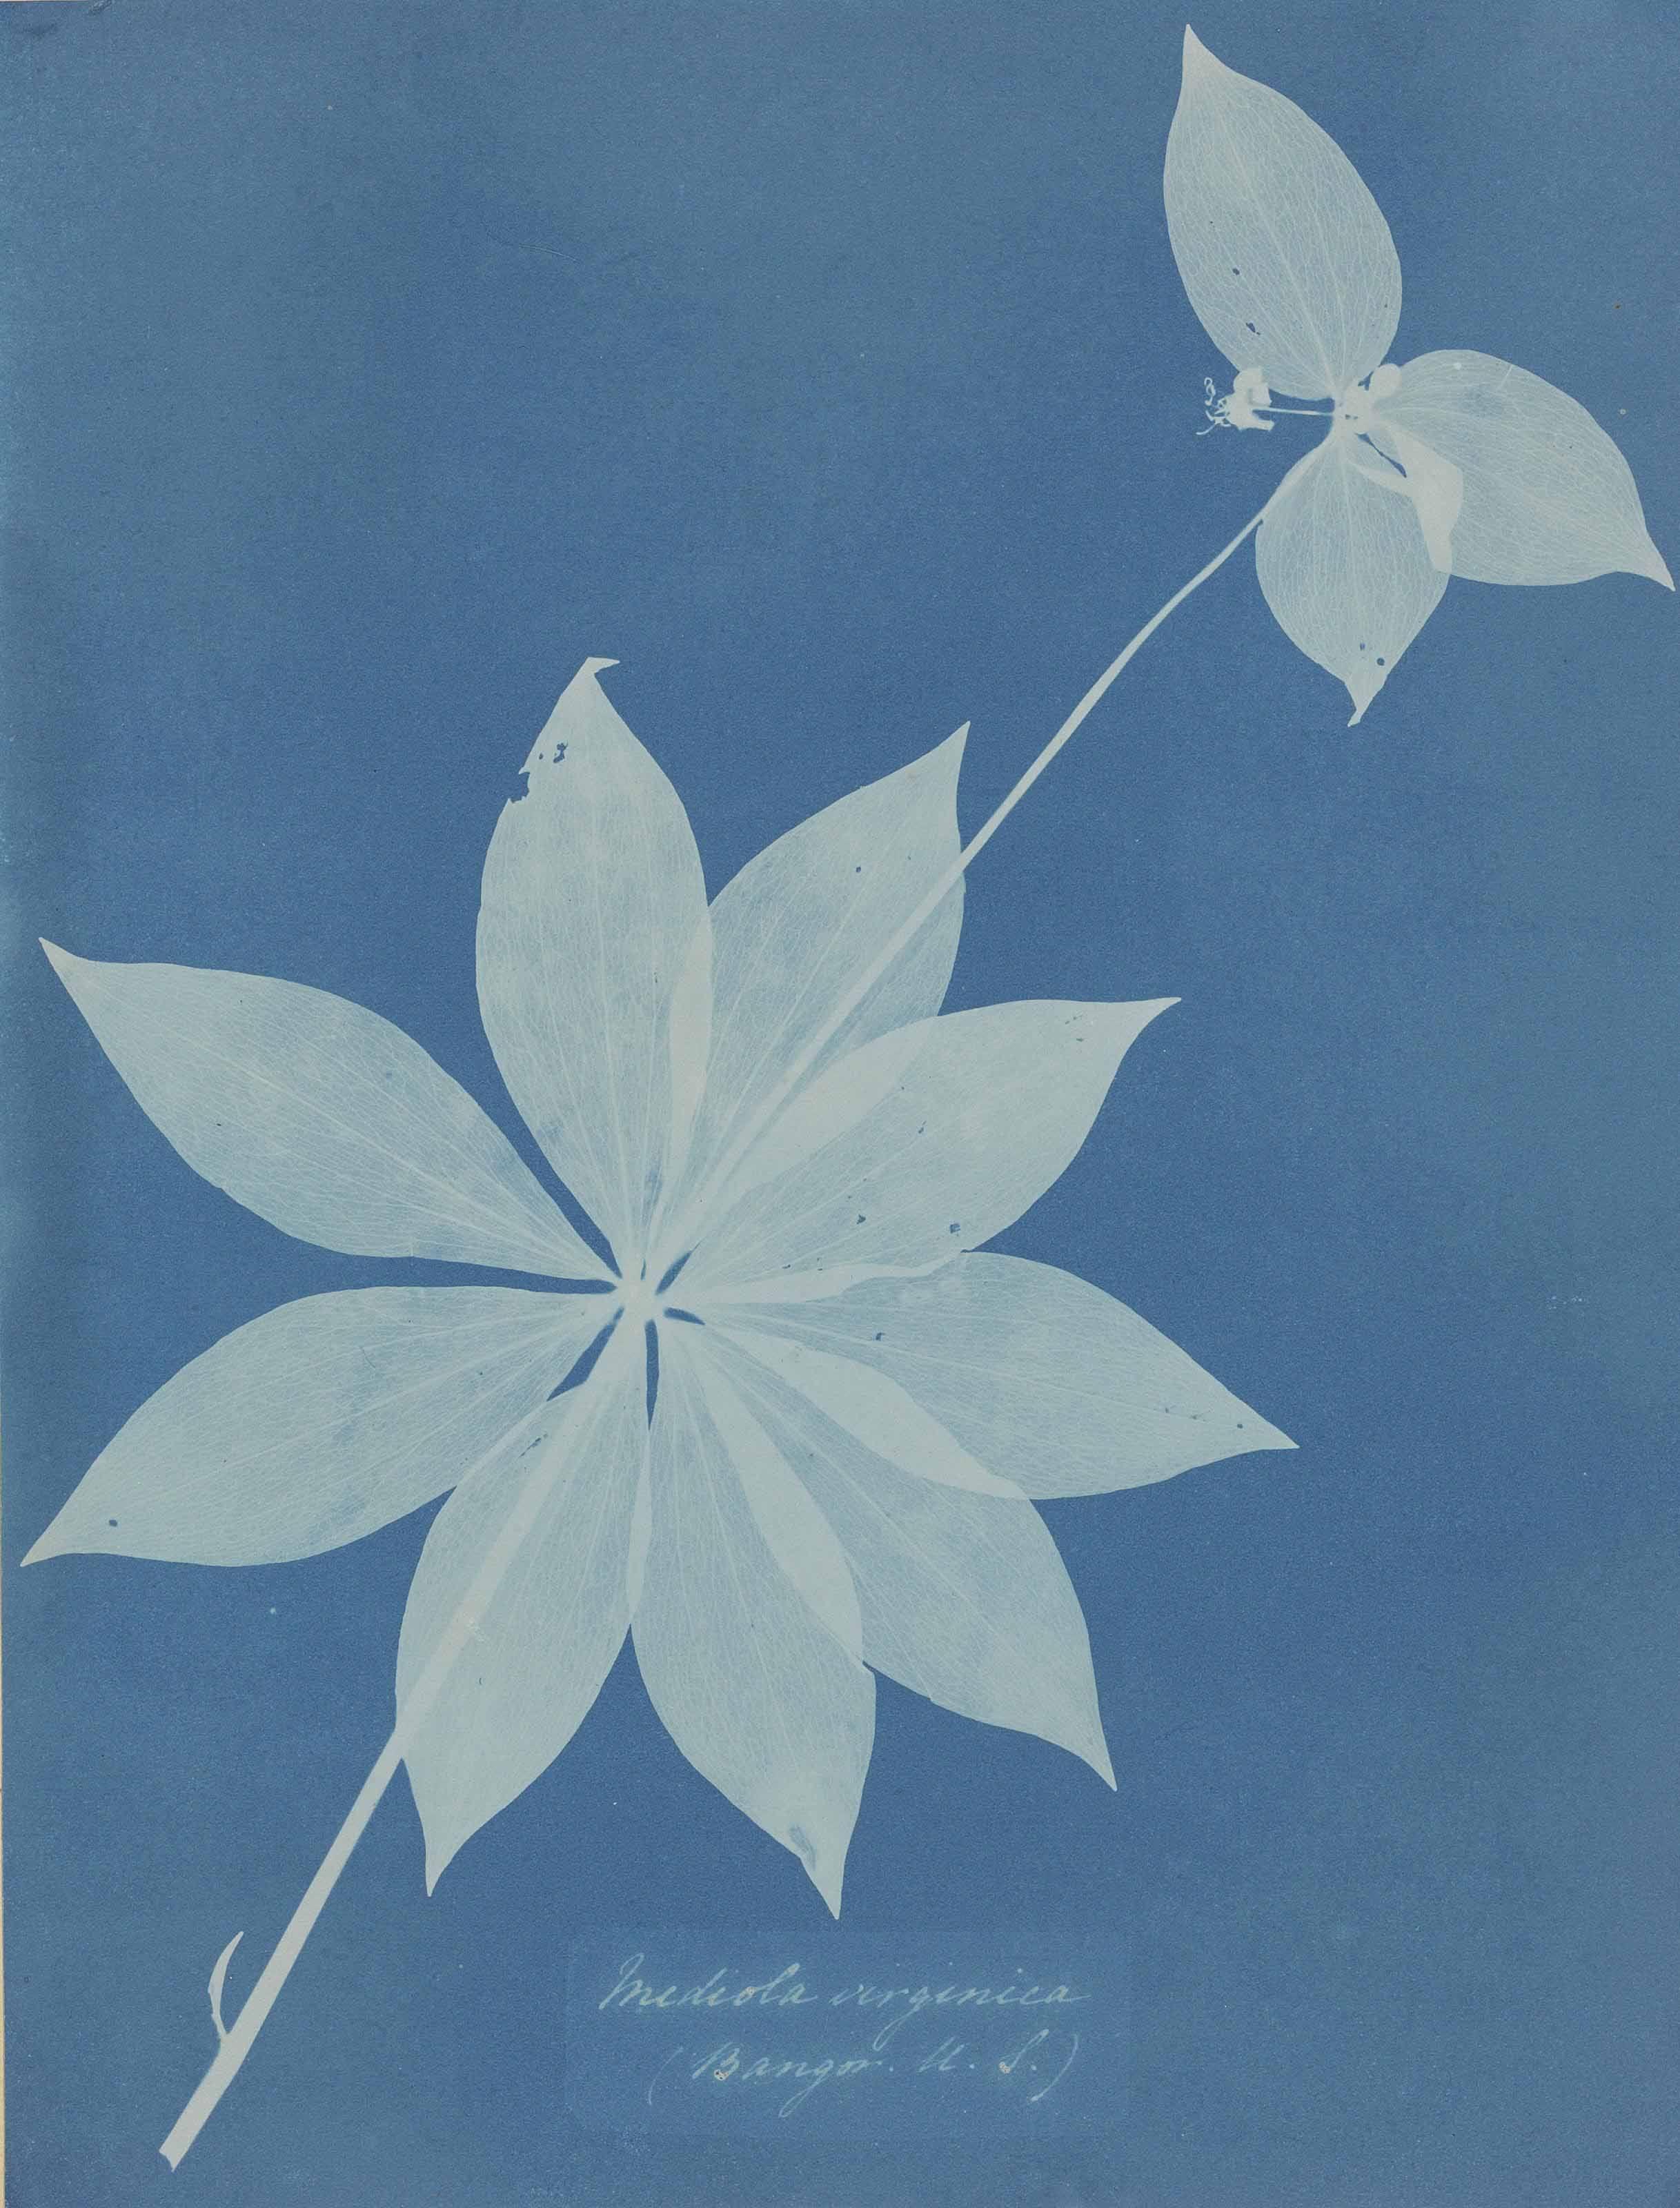 Anna Atkins Atkins Cyanotype Prints